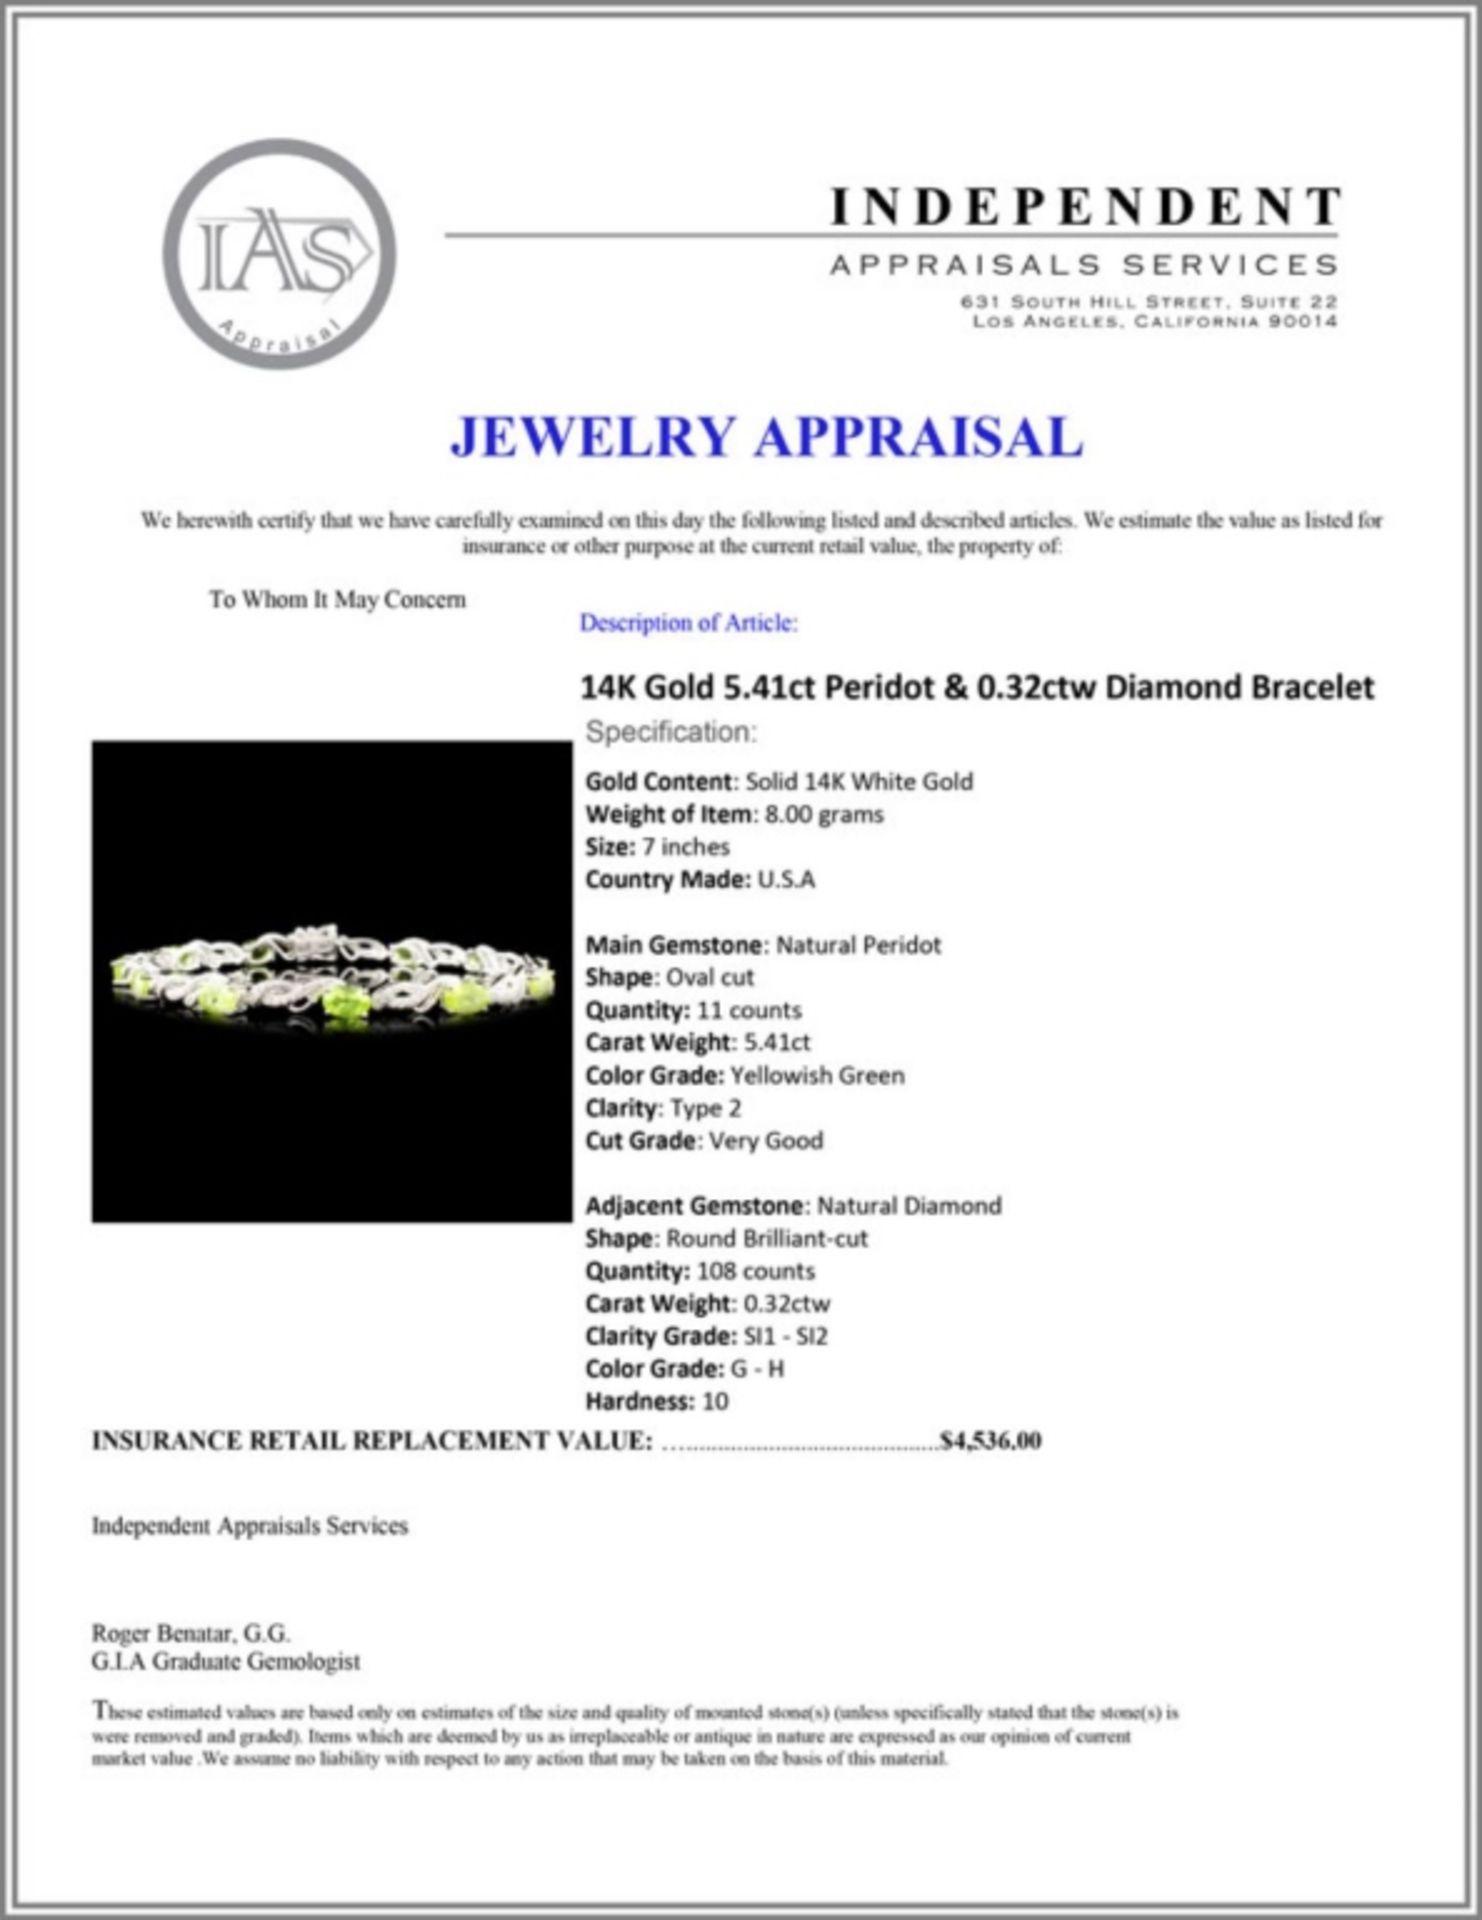 14K Gold 5.41ct Peridot & 0.32ctw Diamond Bracelet - Image 4 of 4